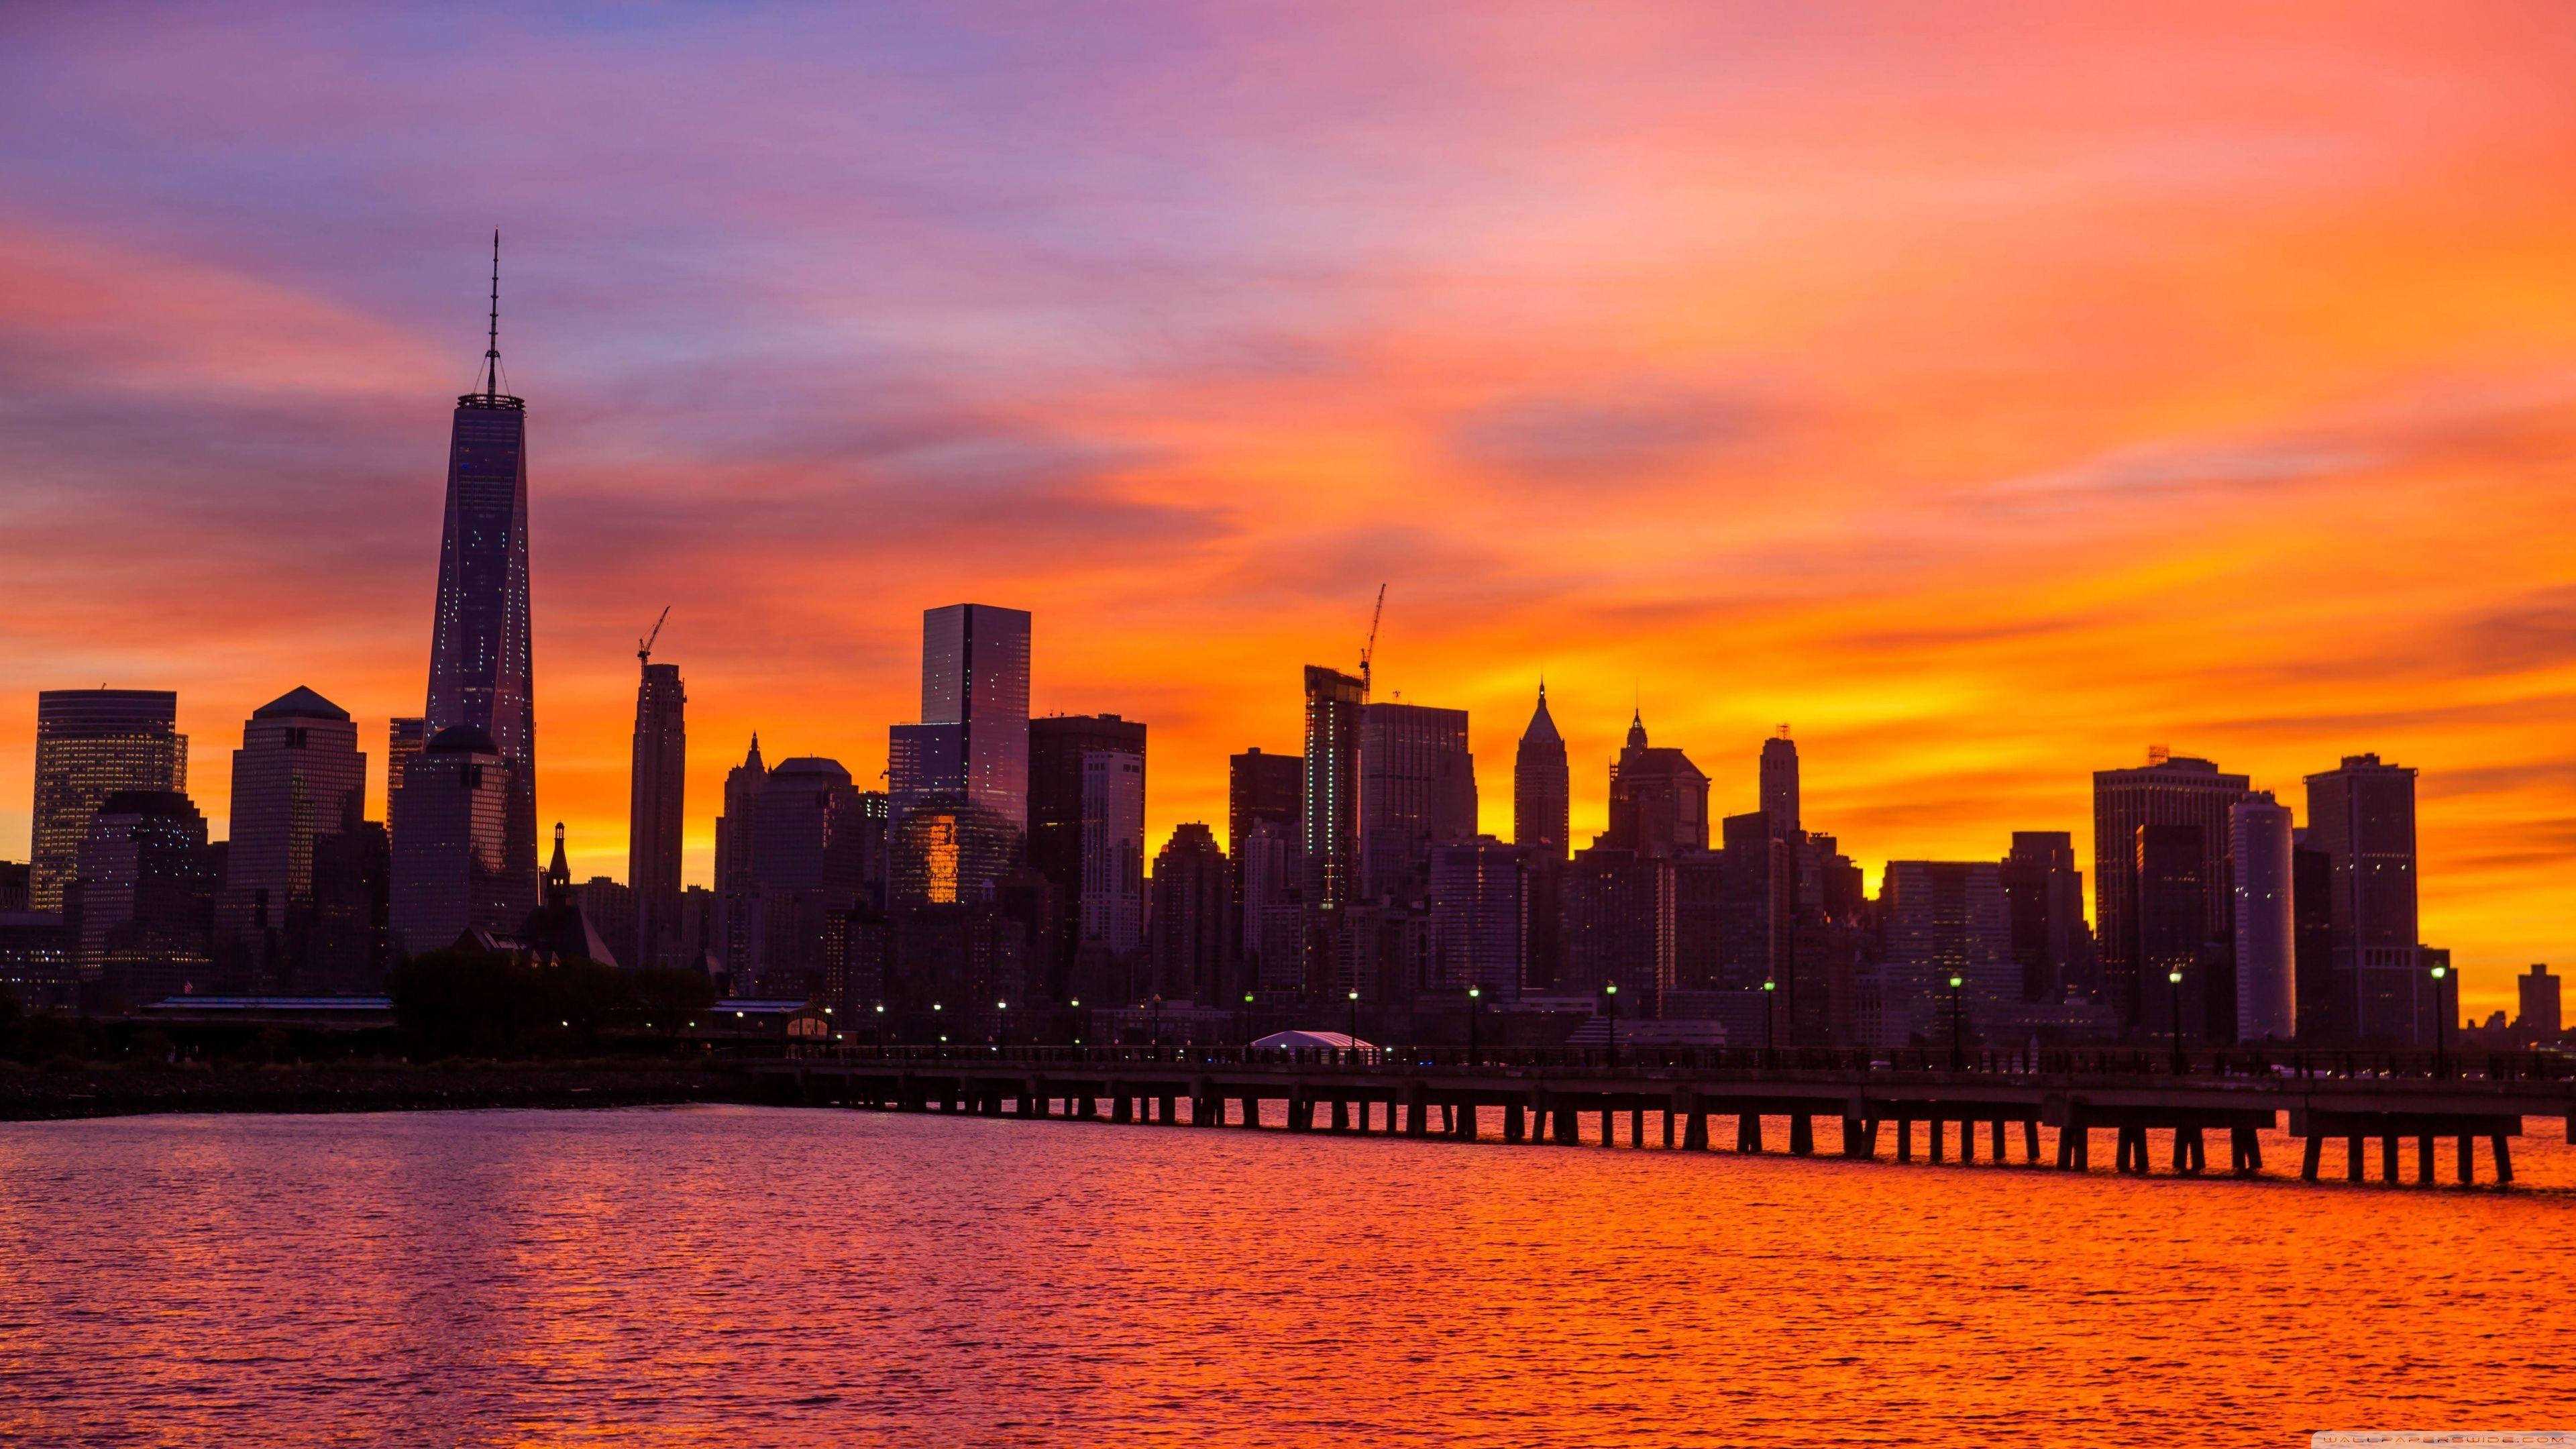 New York City Skyline Wallpapers Widescreen - Wallpaper Cave